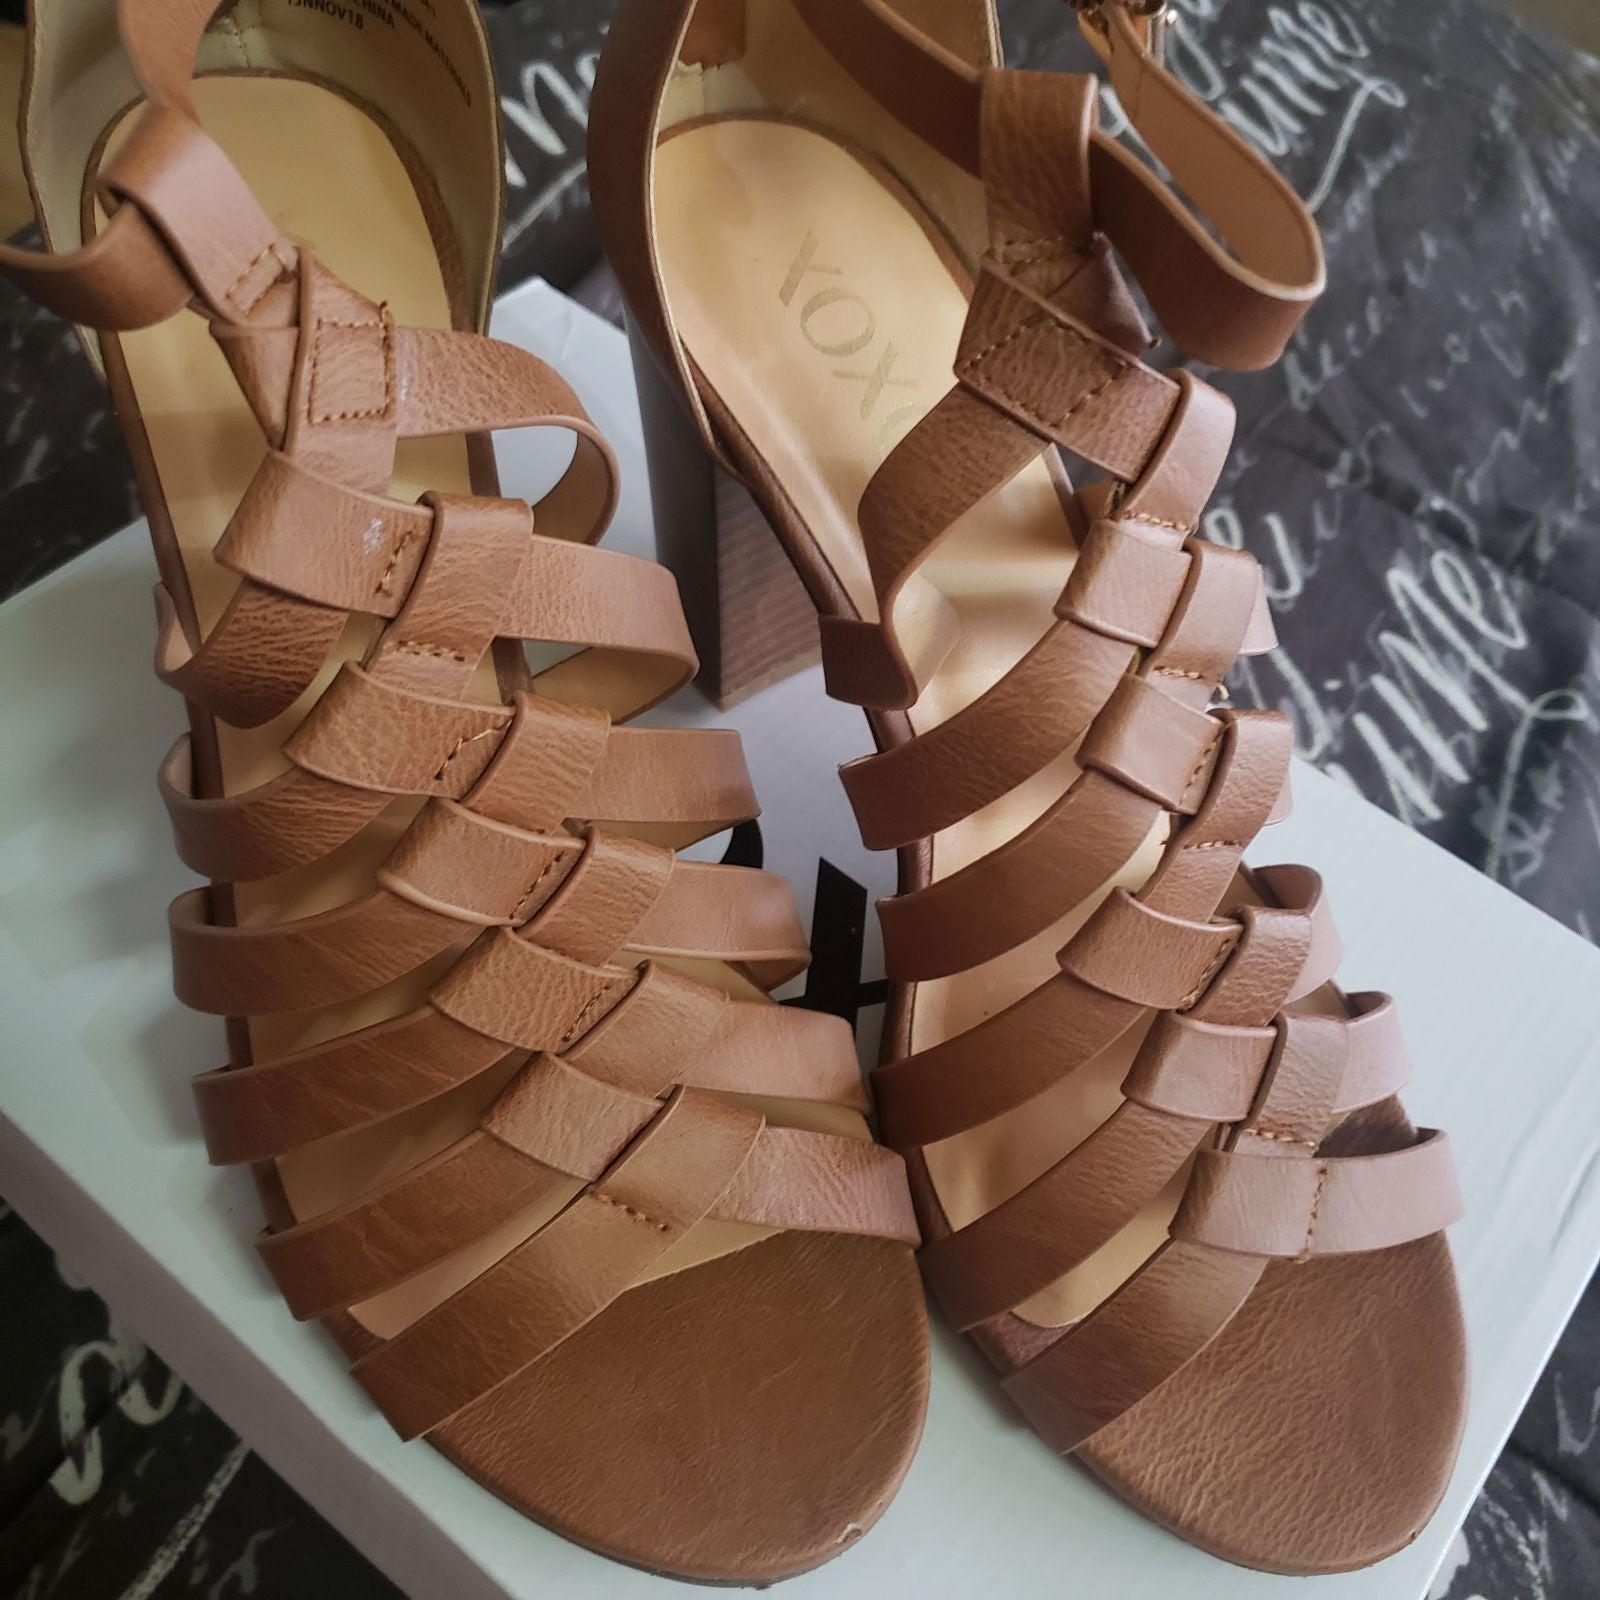 XOXO Brown Sandals